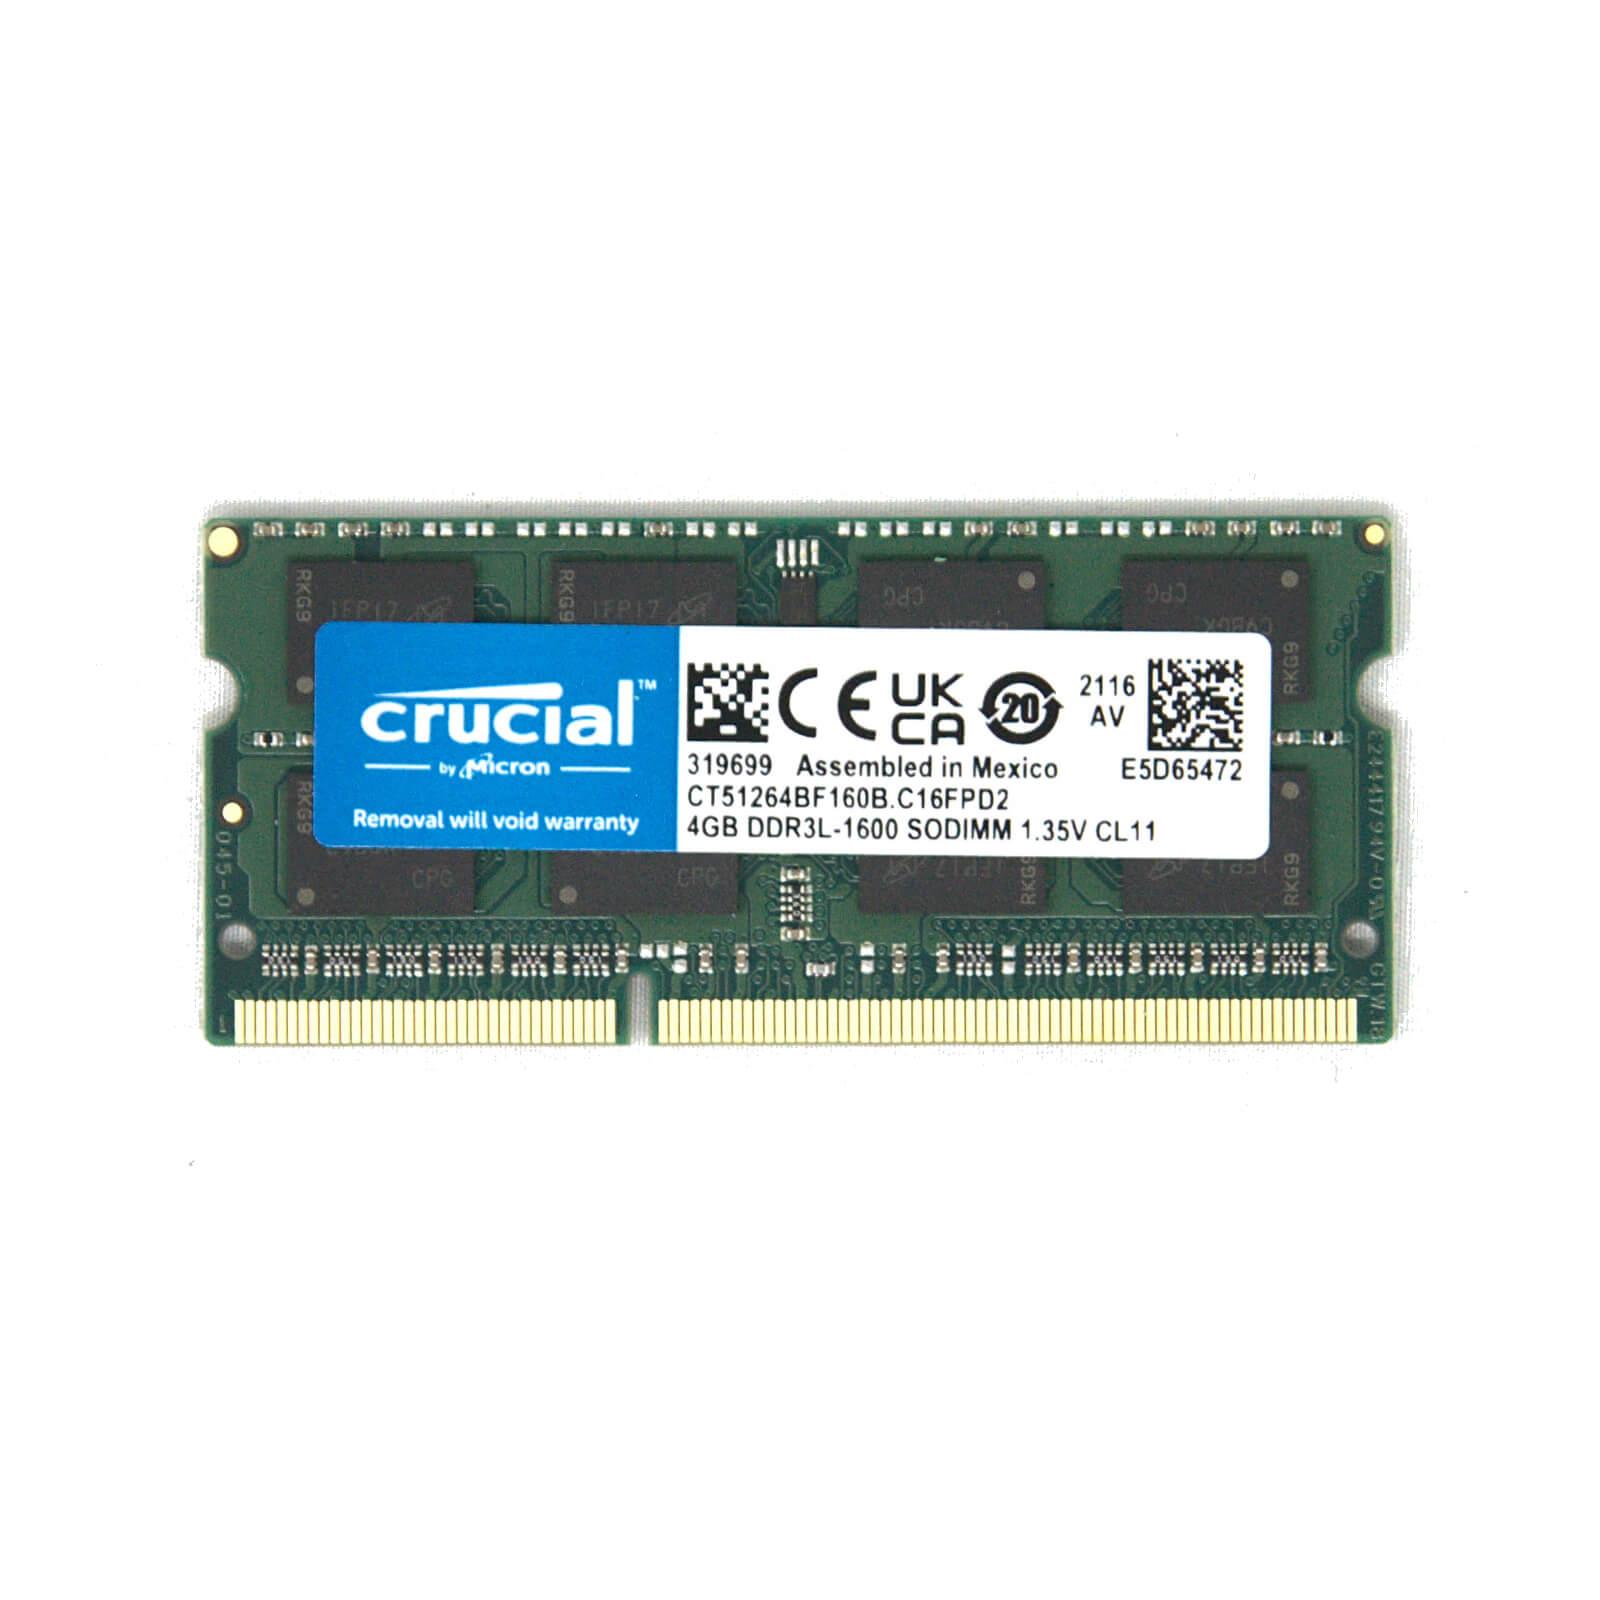 Crucial DDR3L SO-DIMM Memory Module – 4GB